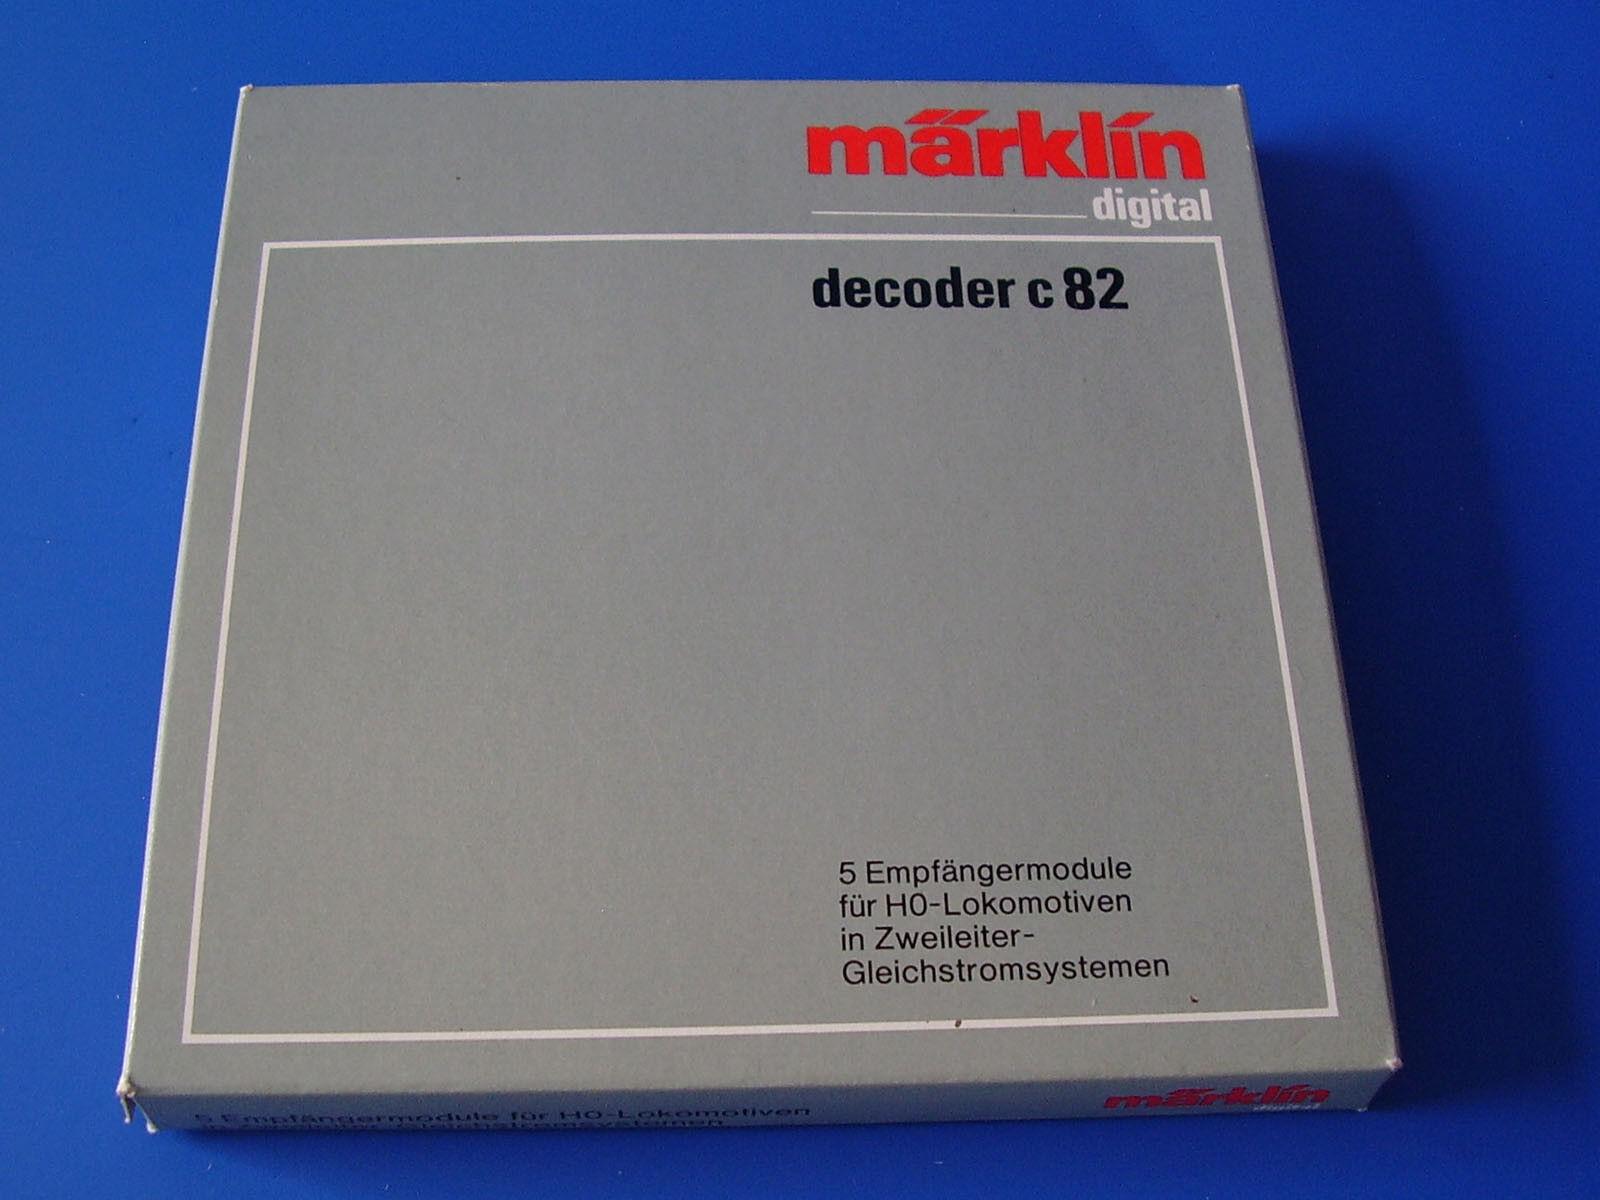 MÄRKLIN - 6082 - 5x decoder c 82   OVP - DIGITAL   NEU  | Zu verkaufen